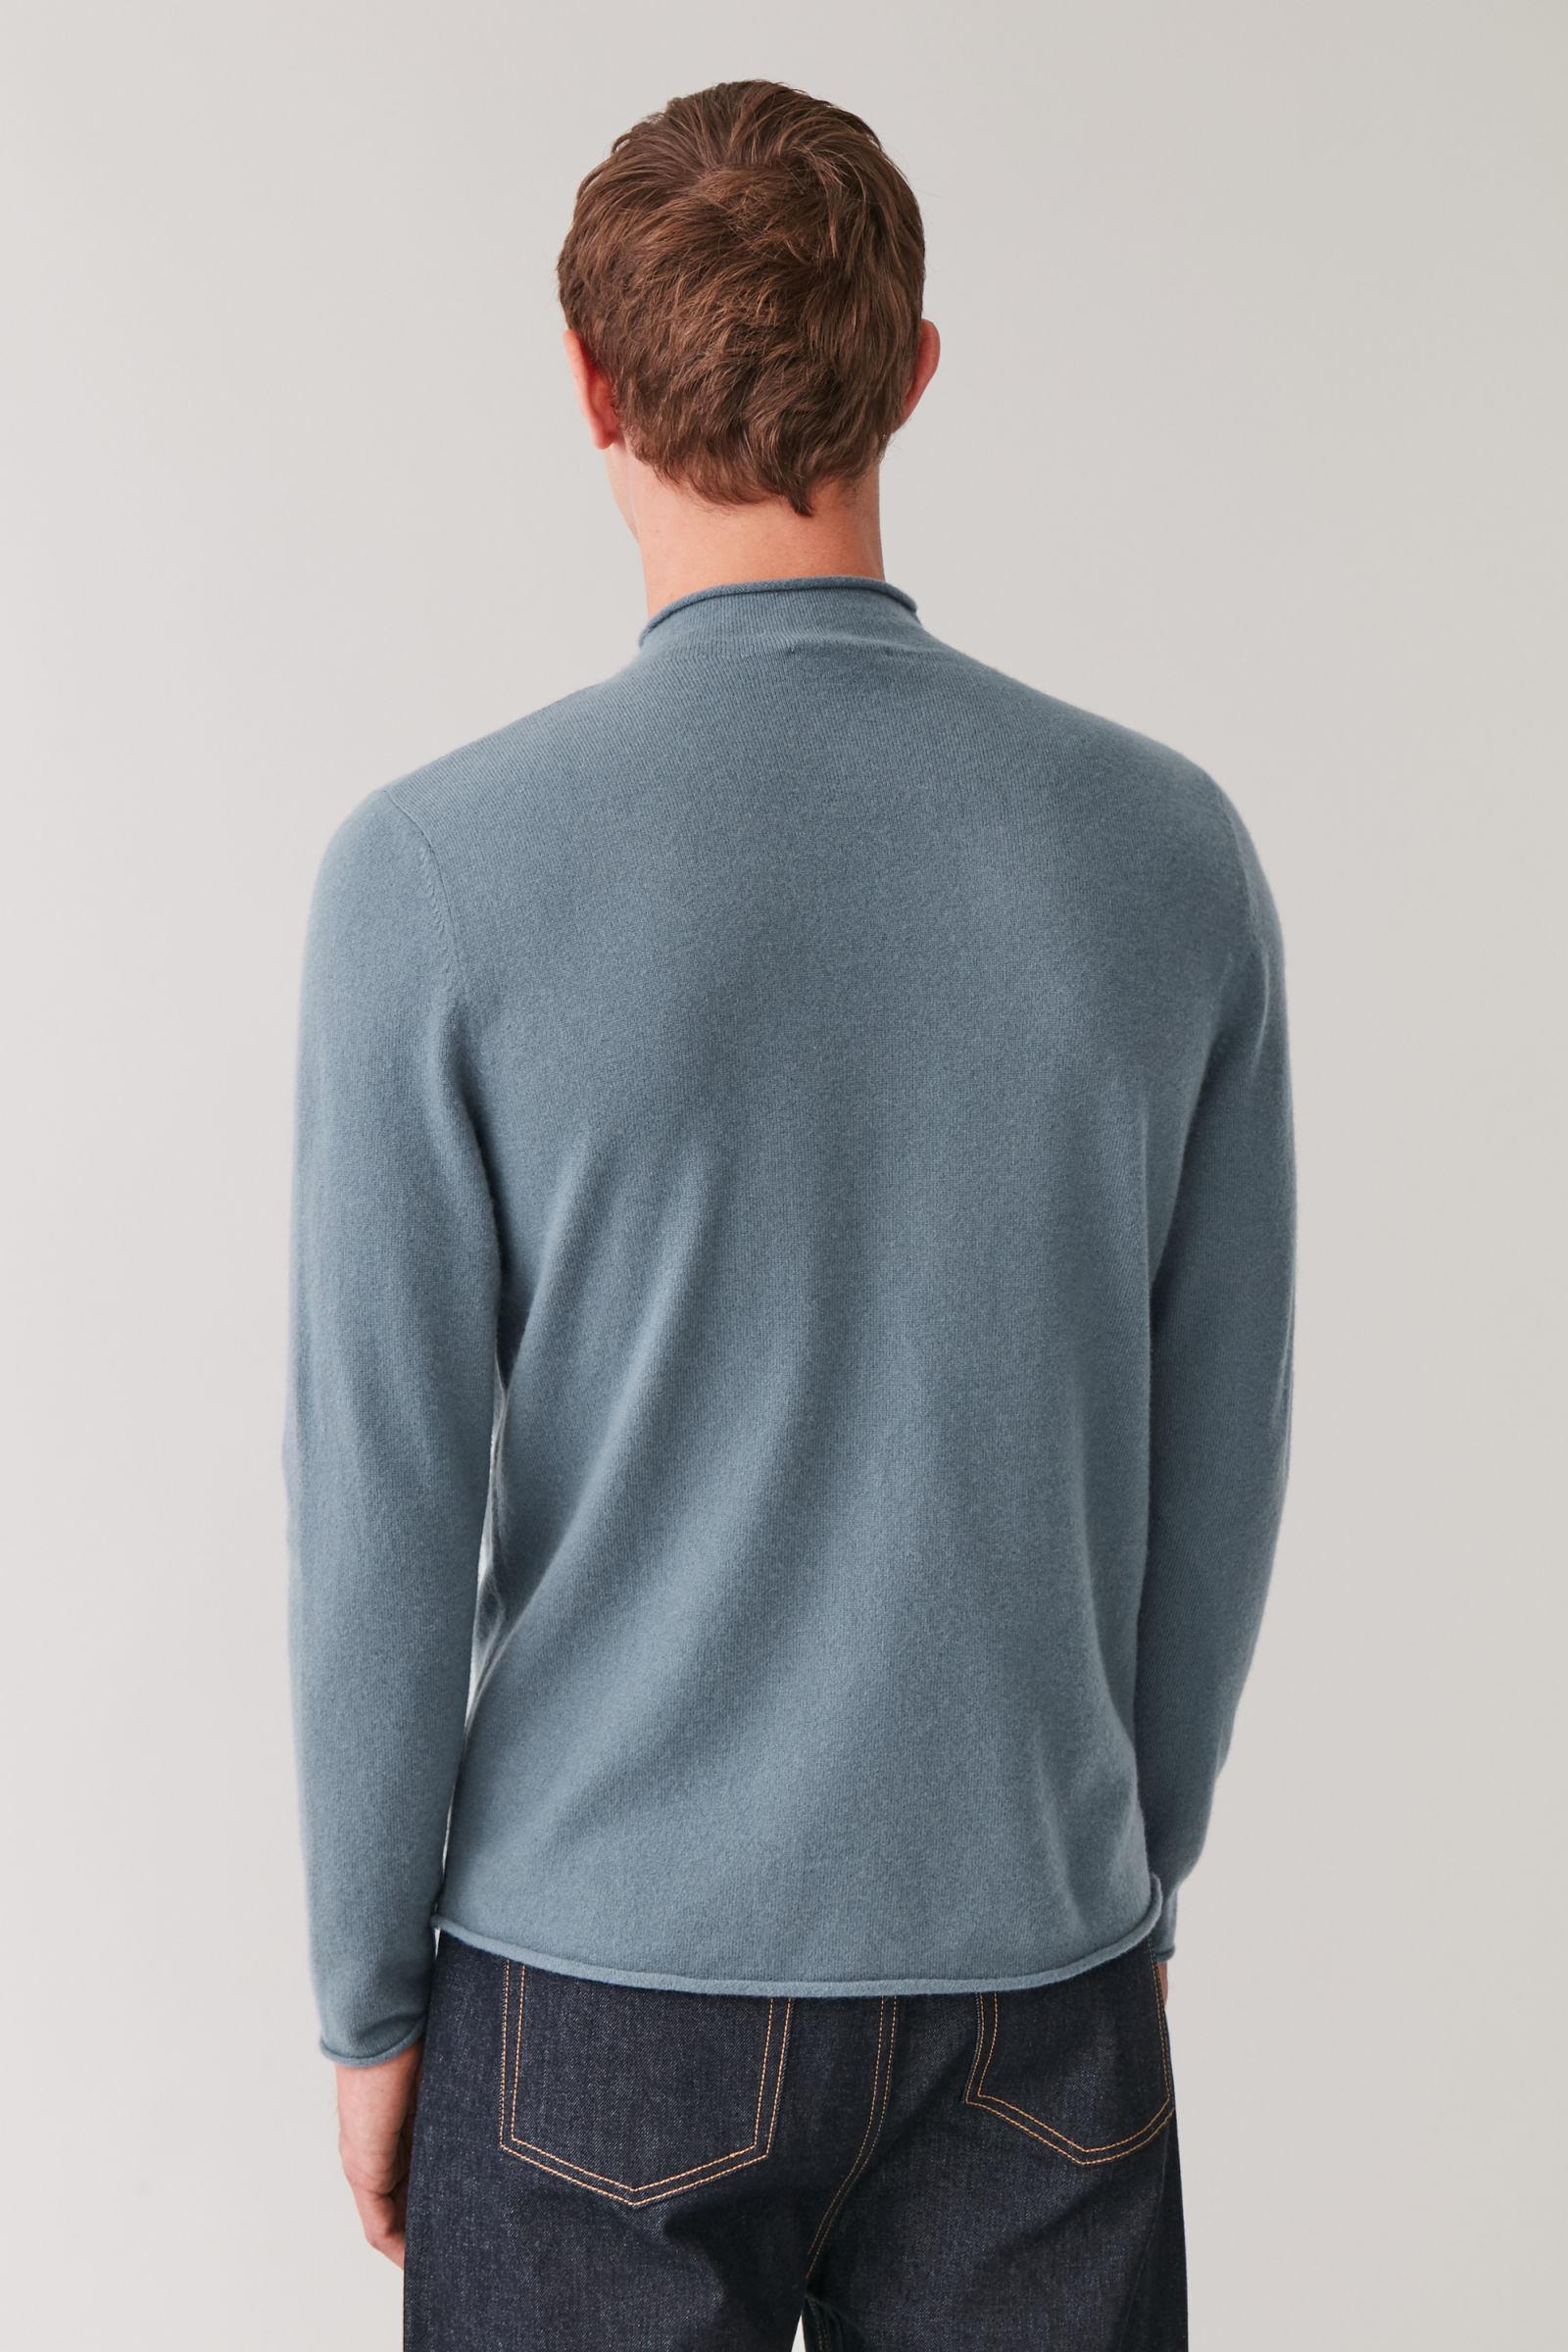 COS 캐시미어 모크넥 스웨터의 라이트 슬레이트 블루컬러 ECOMLook입니다.